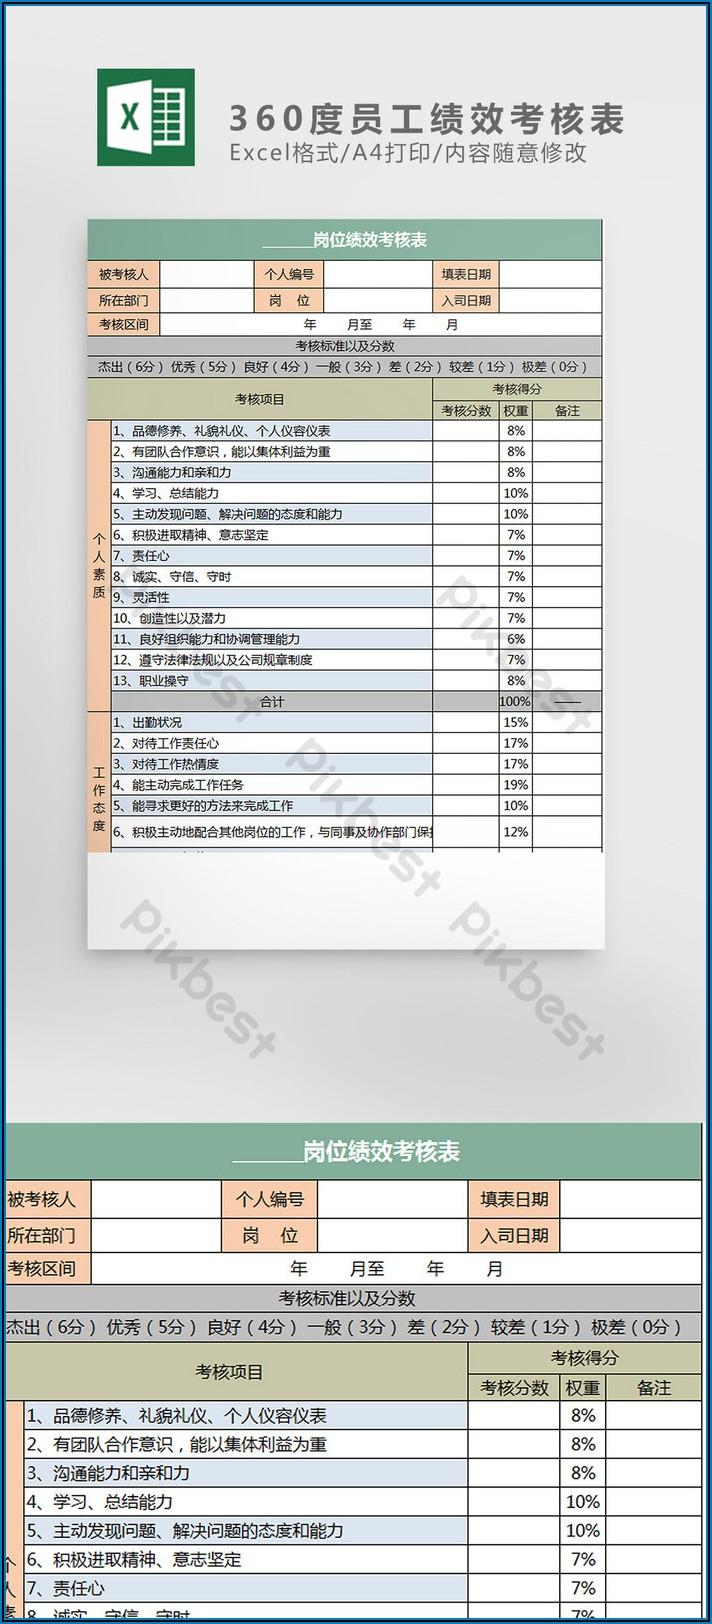 Employee Performance Appraisal Form 360 Degree